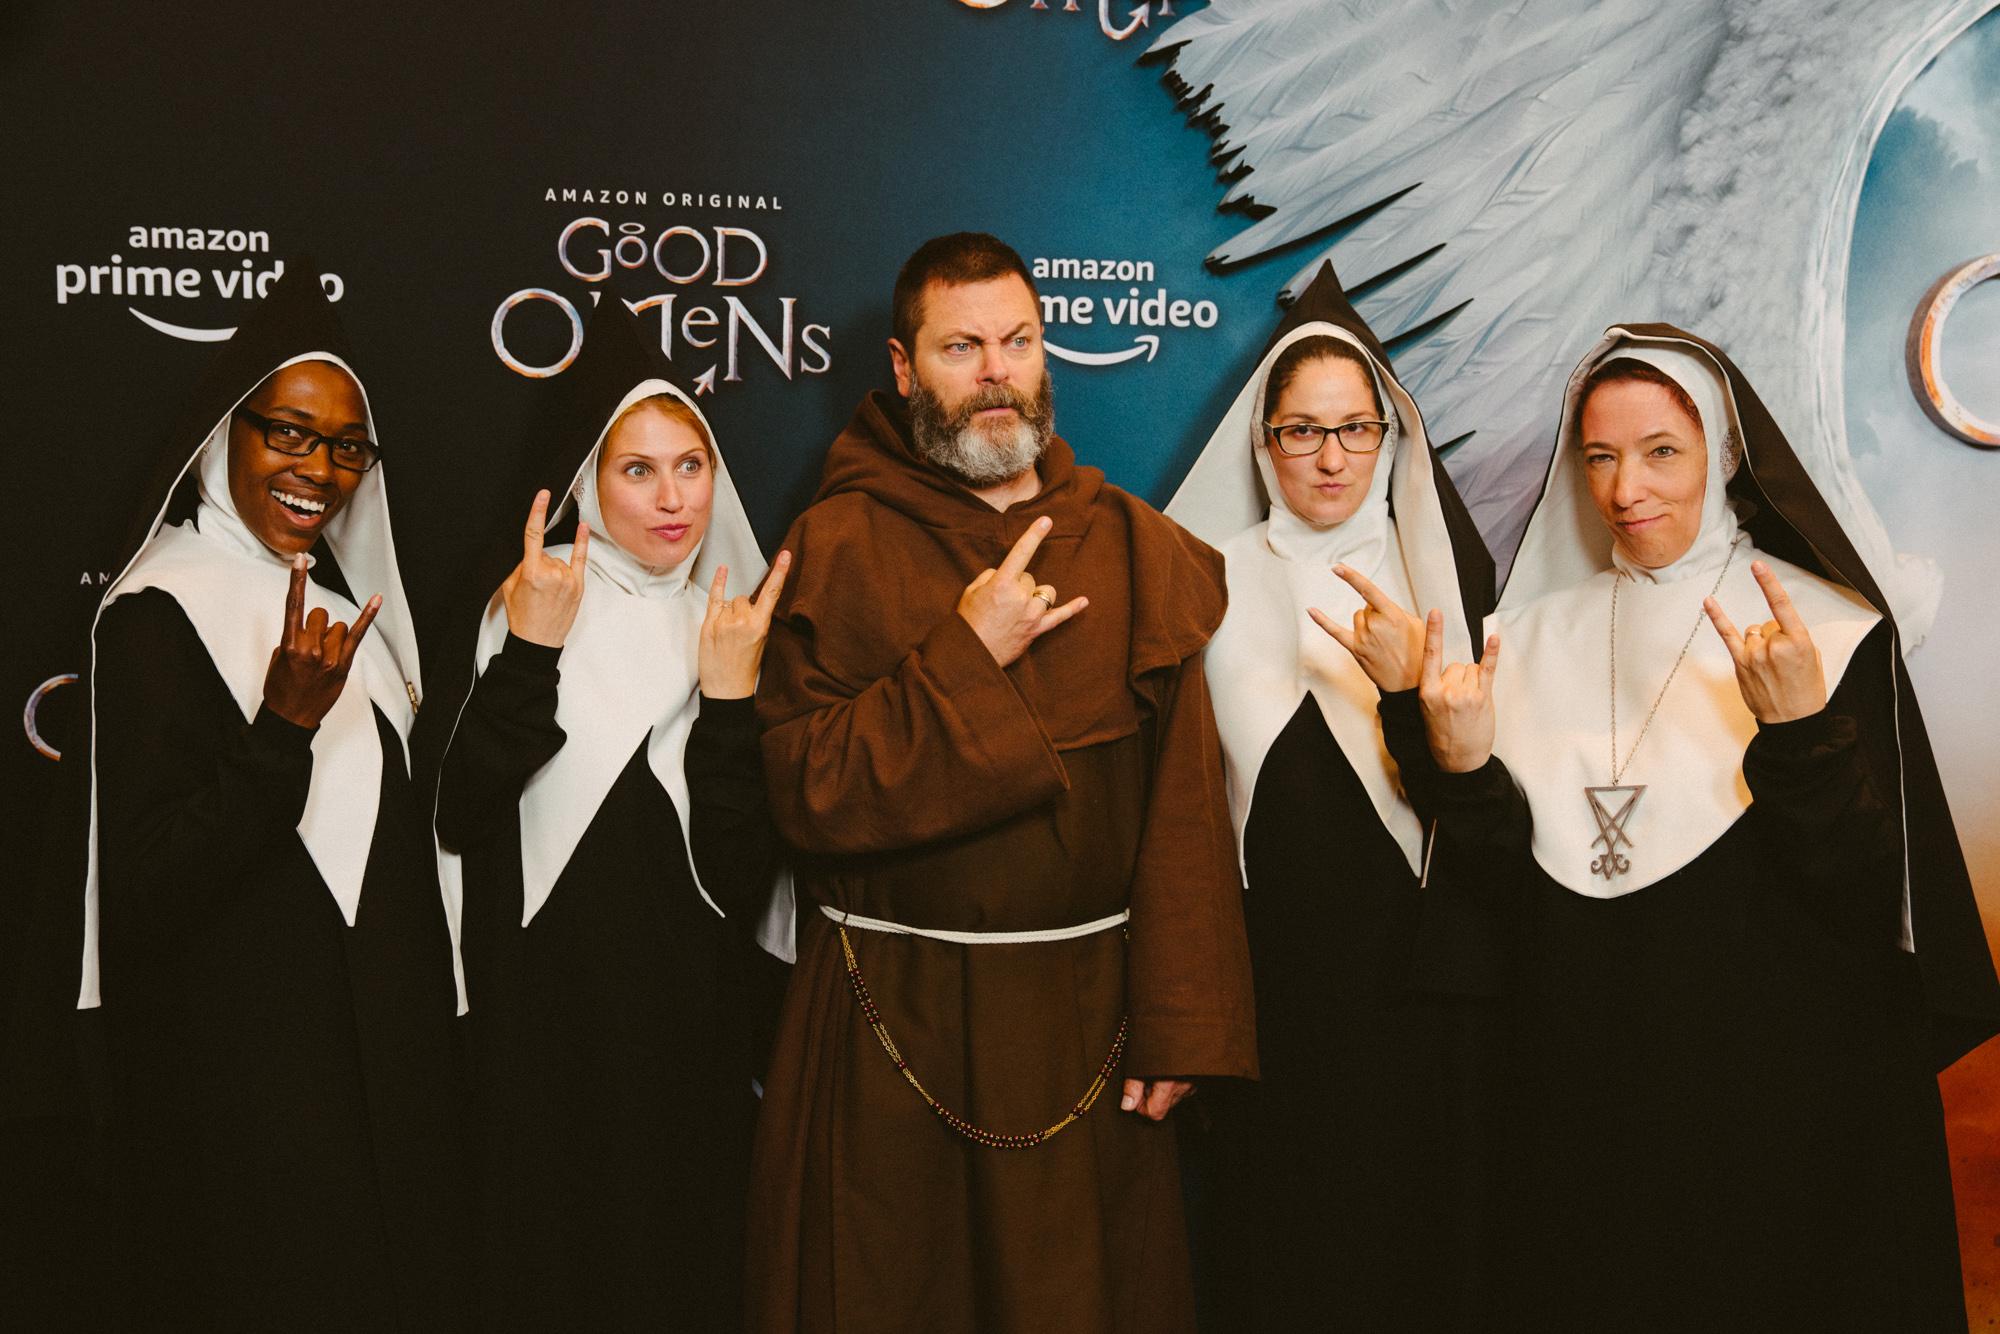 Good-Omens-chattering nuns_hal-kirkland_NYC2.jpg